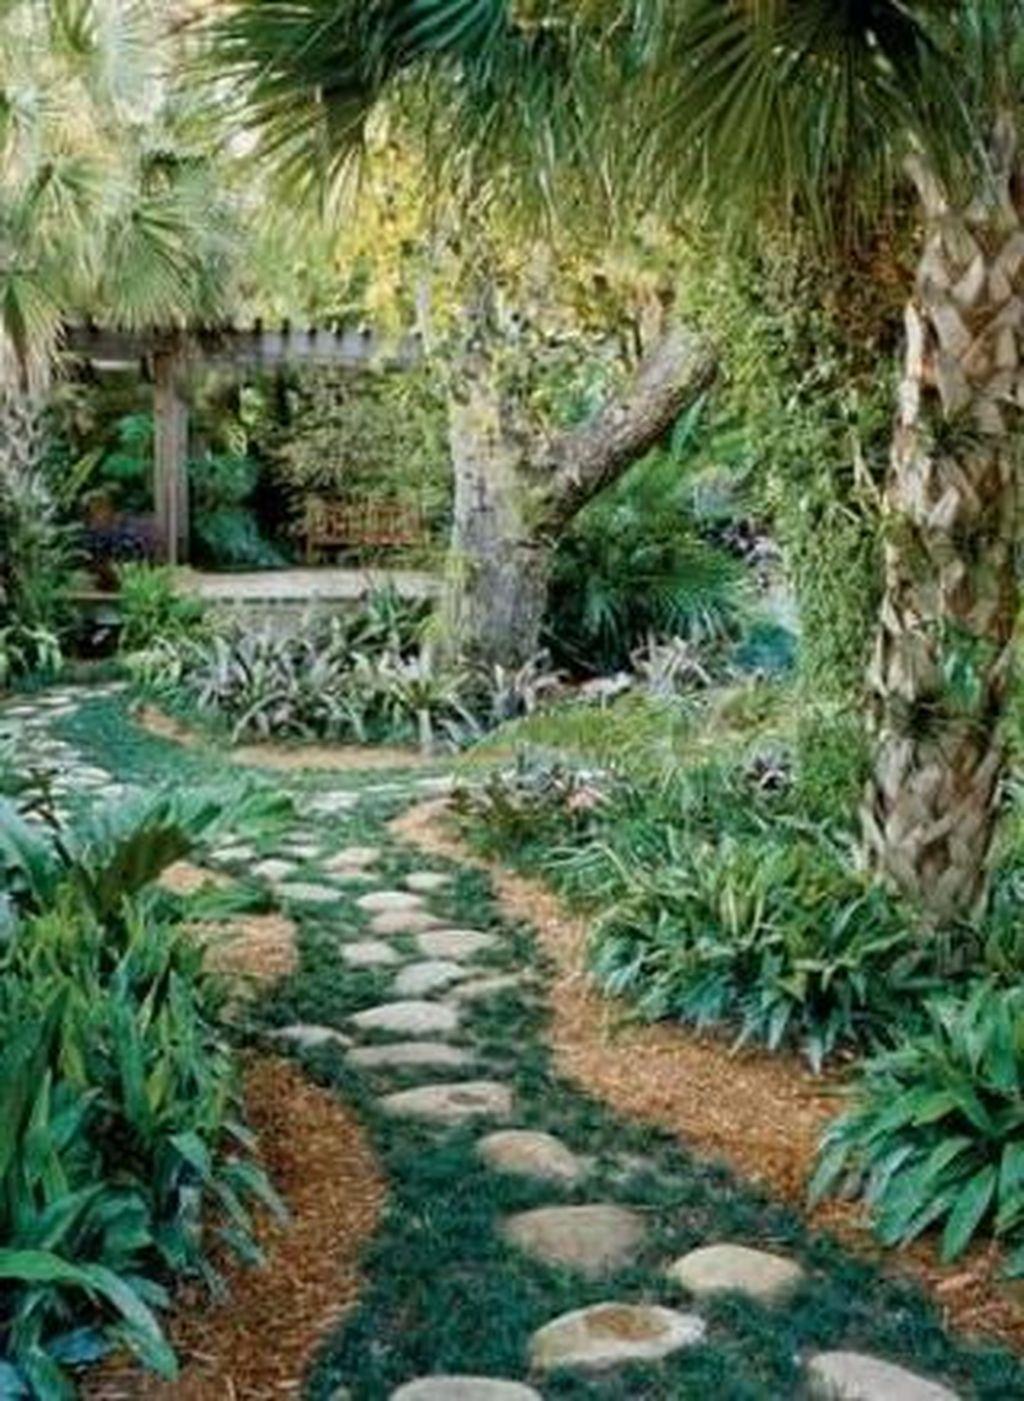 33 Charming Urban Backyard Oasis Design Ideas With Tropical Decor To Try In 2020 Garden Oasis Urban Backyard Backyard Landscaping